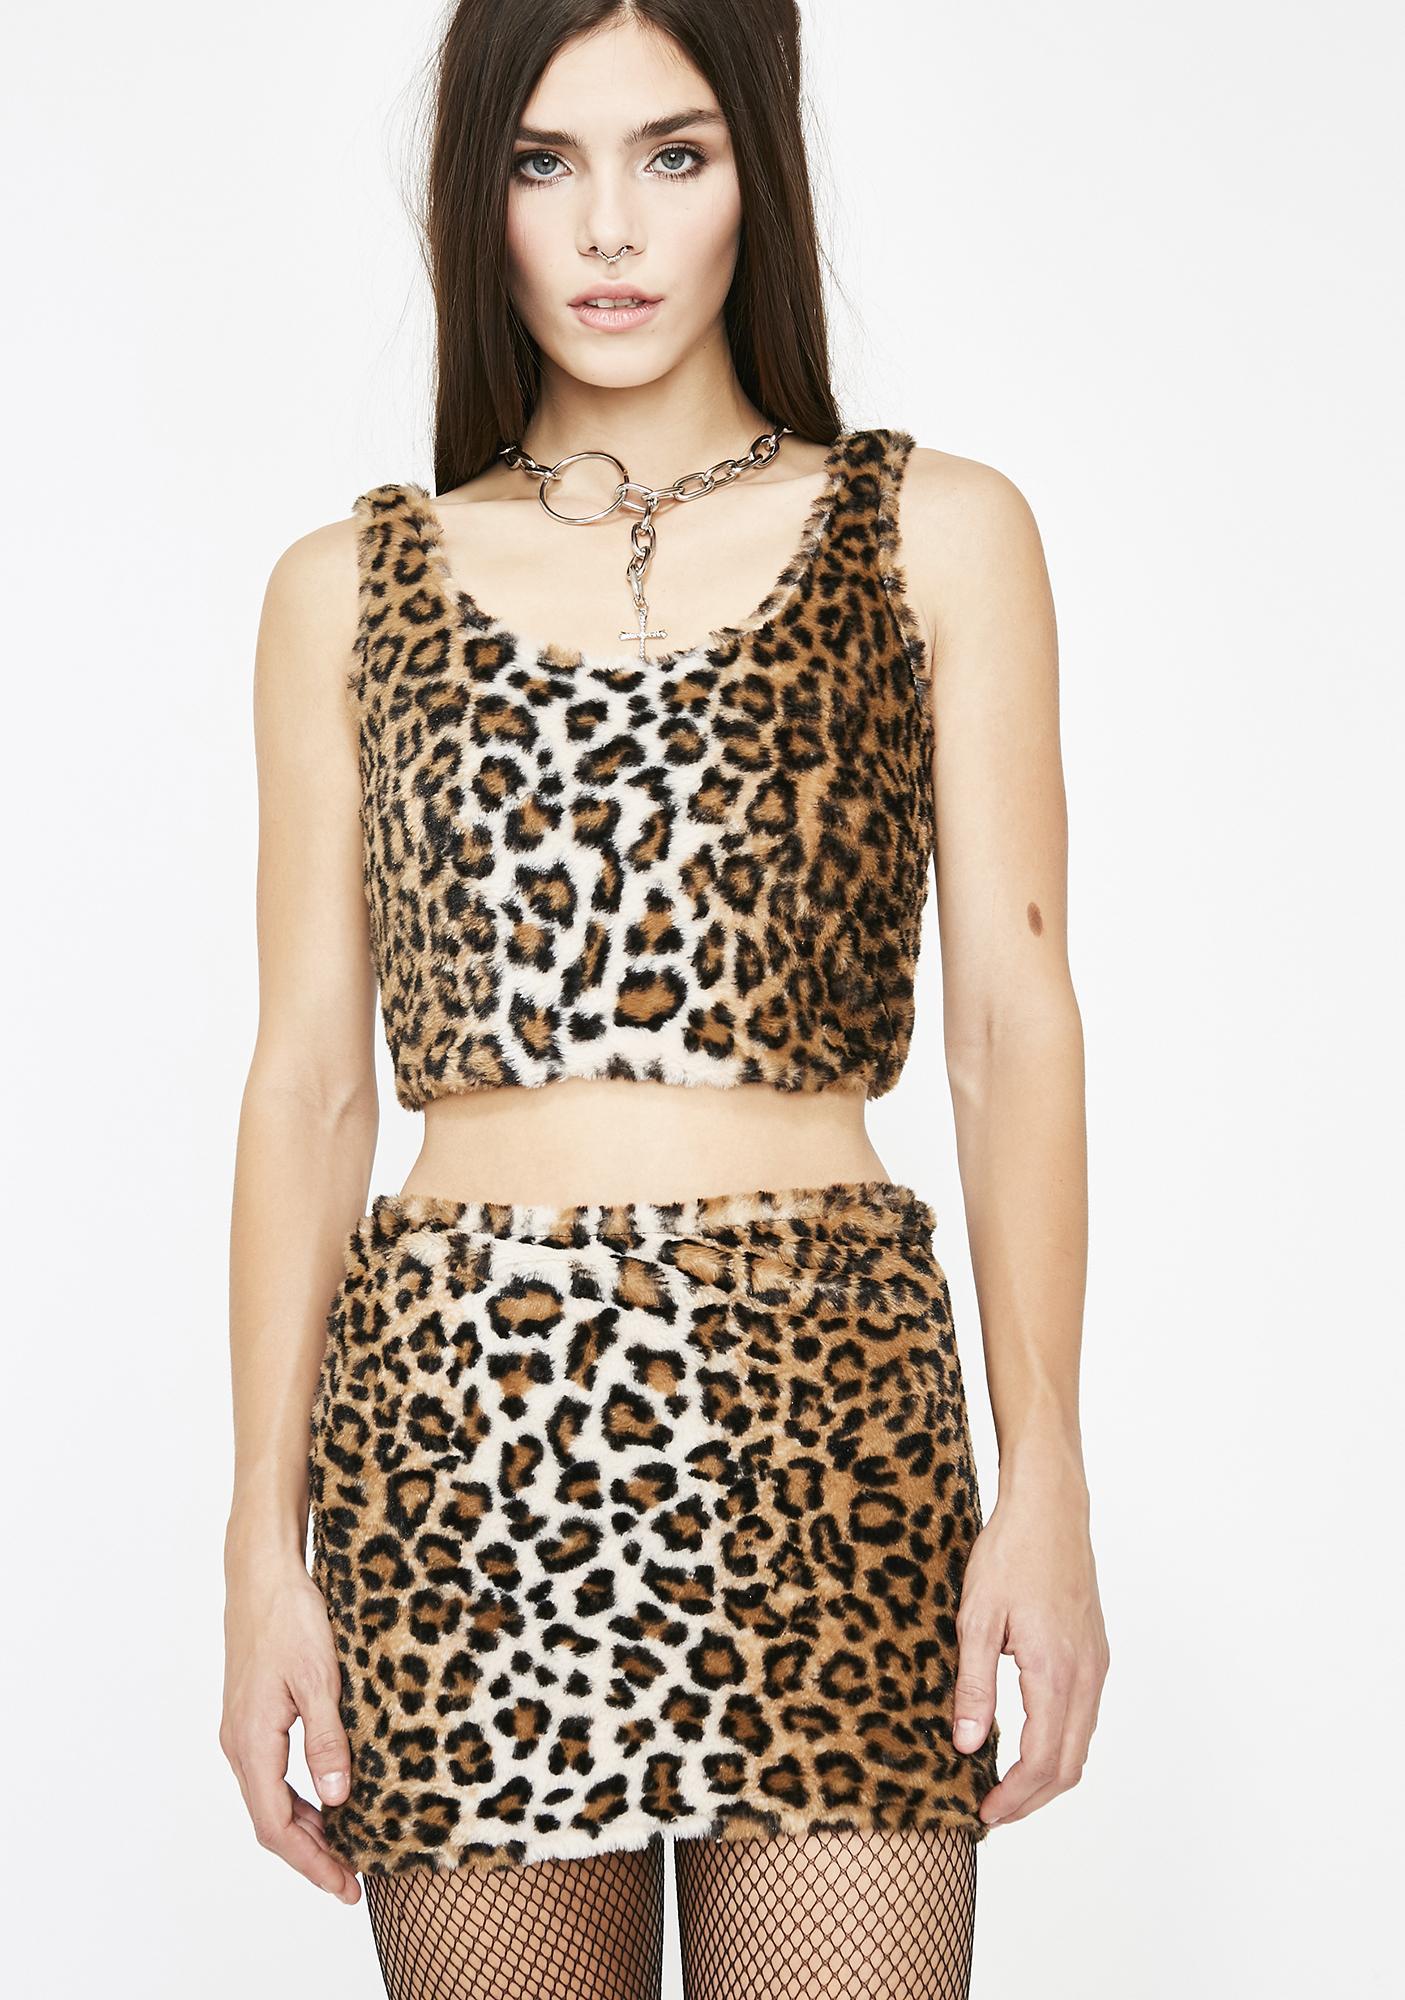 She Beast Leopard Set